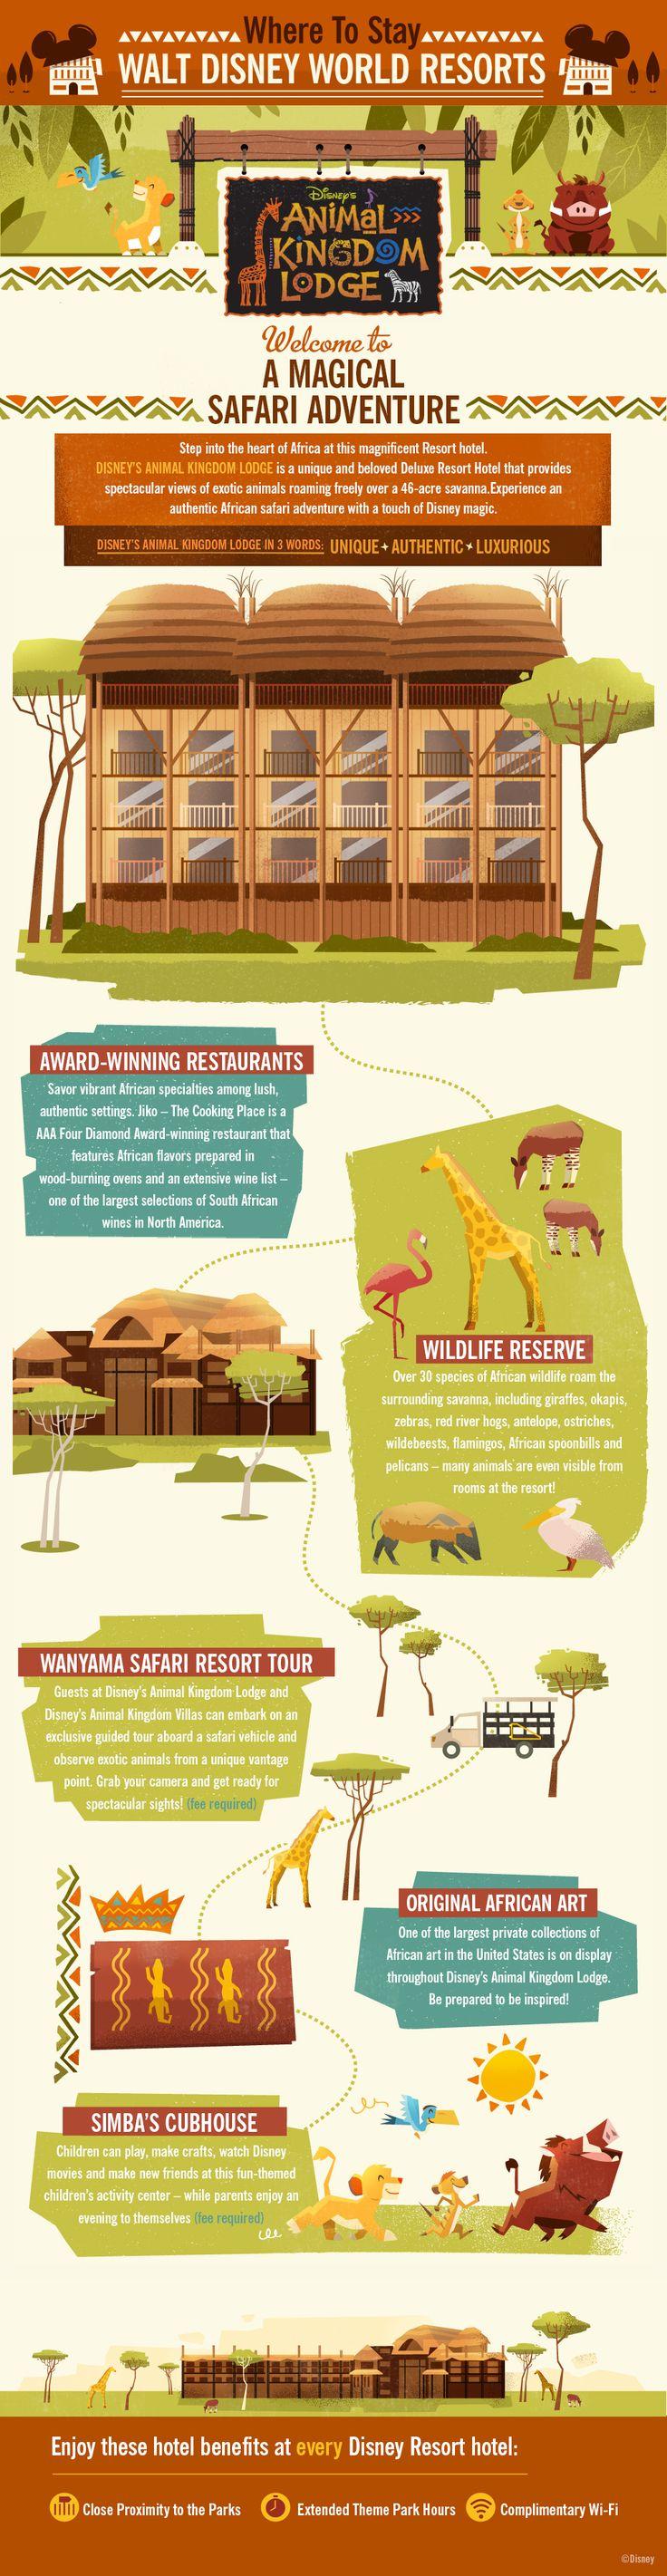 Disney's Animal Kingdom Lodge   Infographic #WaltDisneyWorld